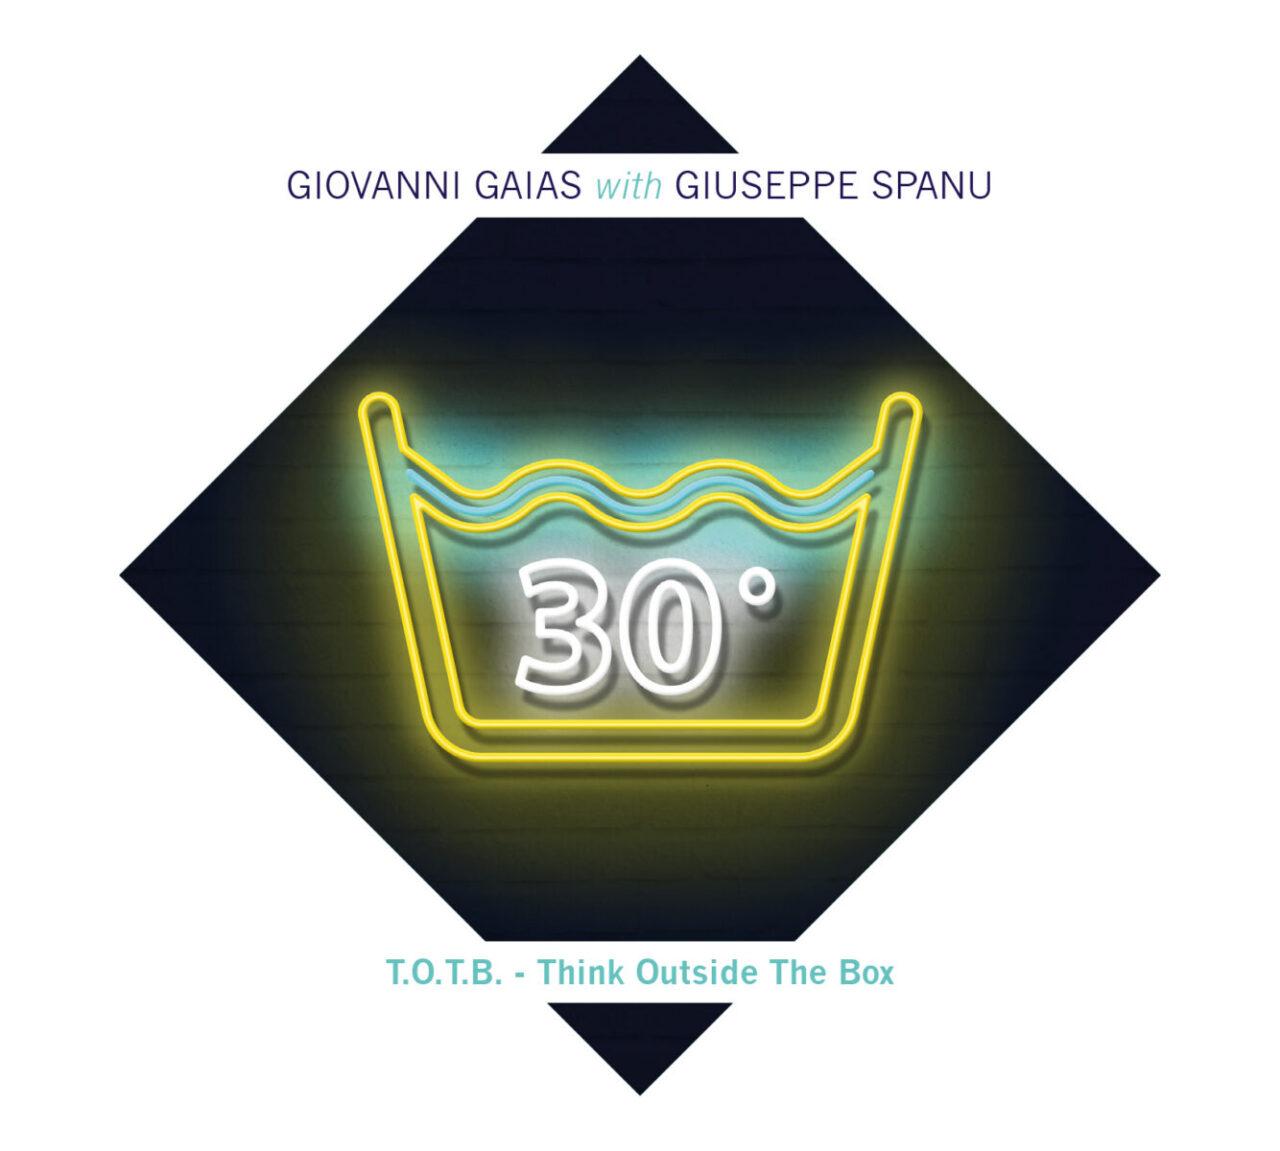 Giovanni Gaias - TOTB - Think Outside The Box - Giuseppe Spanu - Tük Music -Spotify - ascolti - ep - 2021 - Sa Scena - 22 gennaio 2021